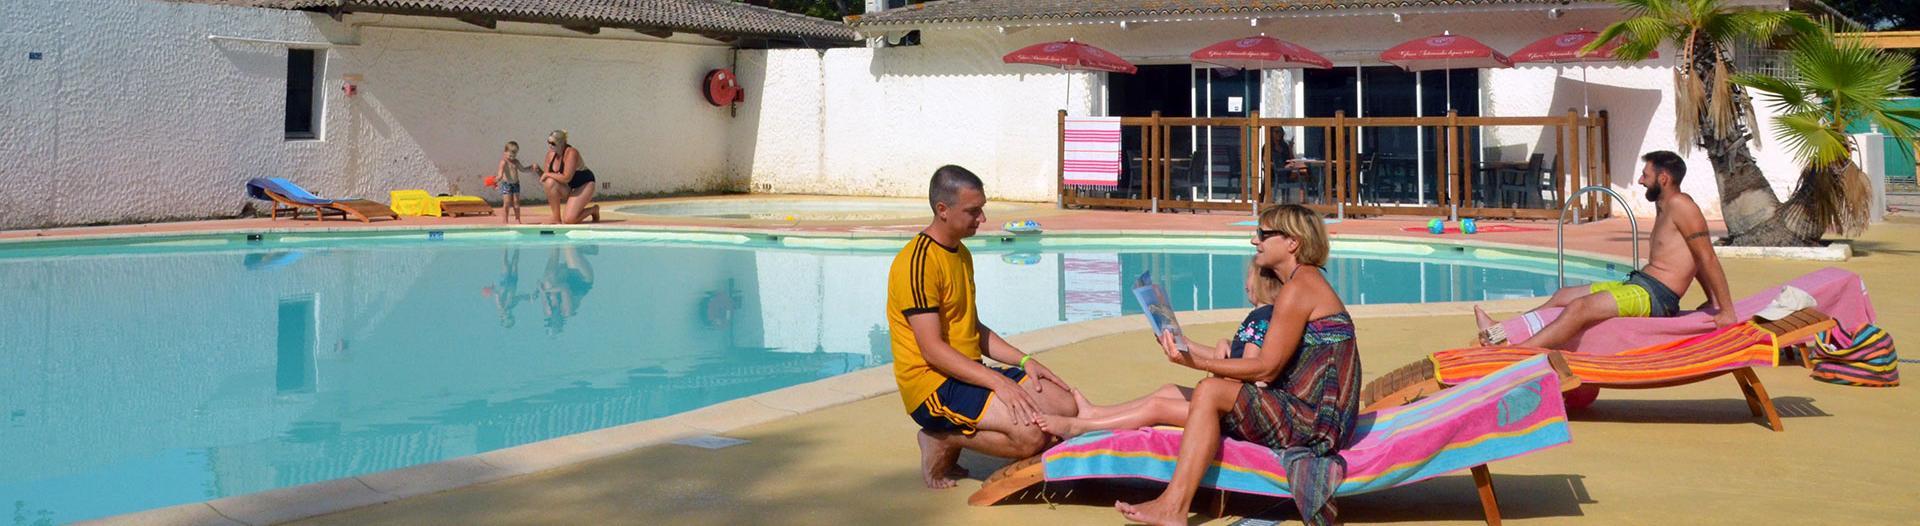 slider-camping-maiana-la-grande-motte-piscine